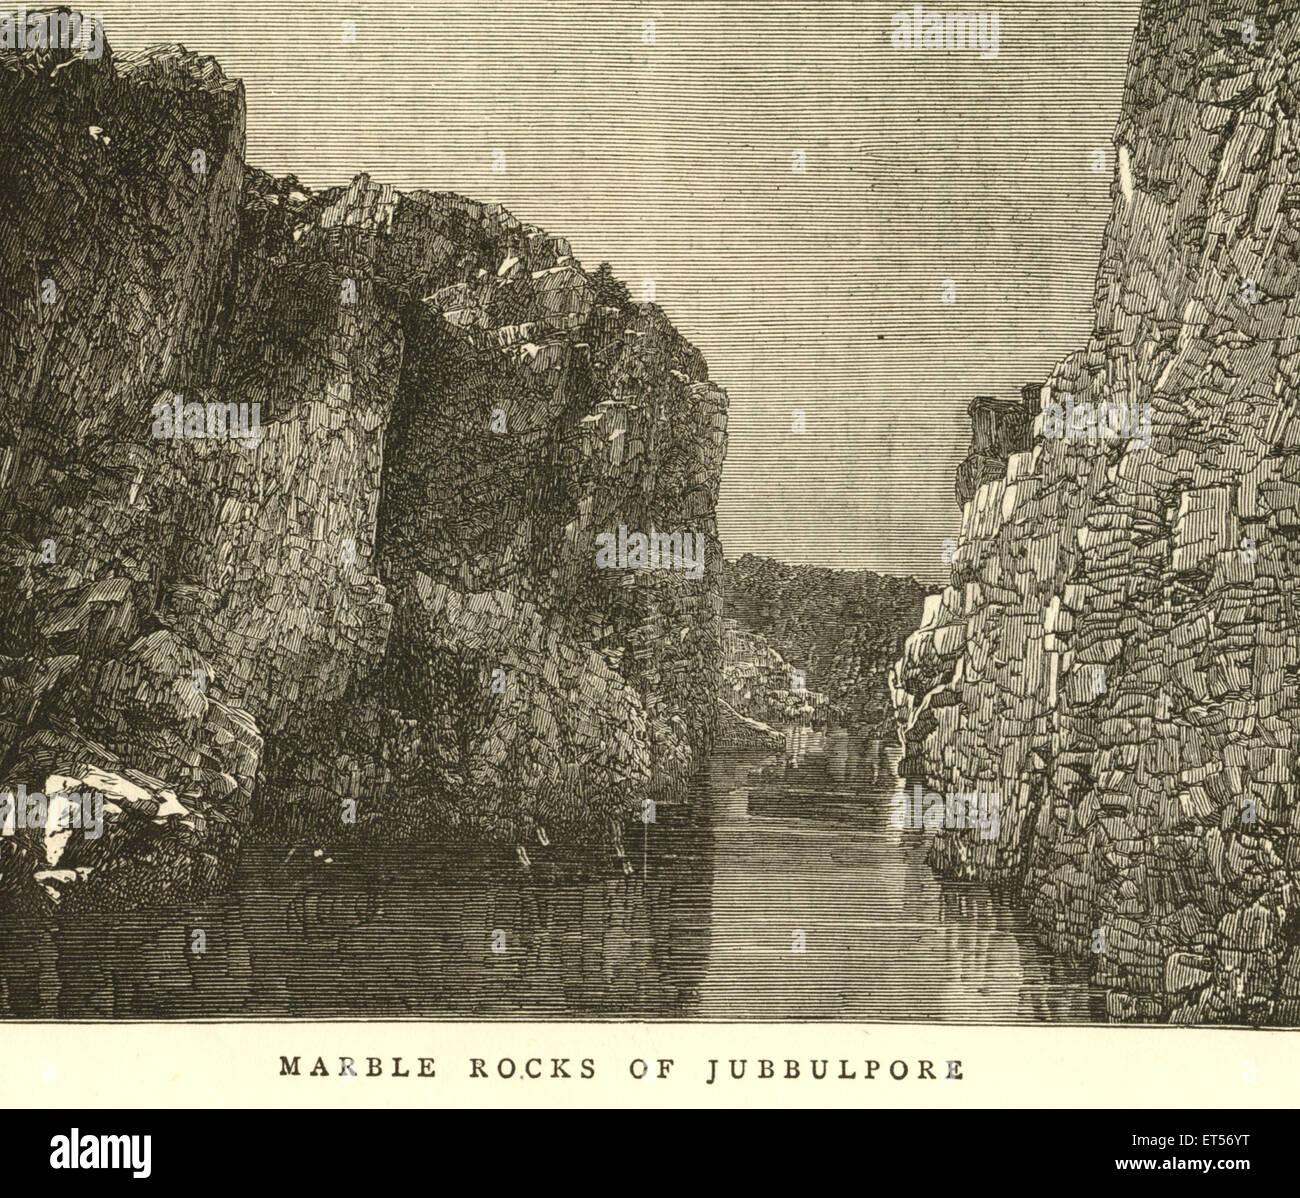 Marble rocks of Jubbulpore ; Jabalpur ; Madhya Pradesh ; India - Stock Image